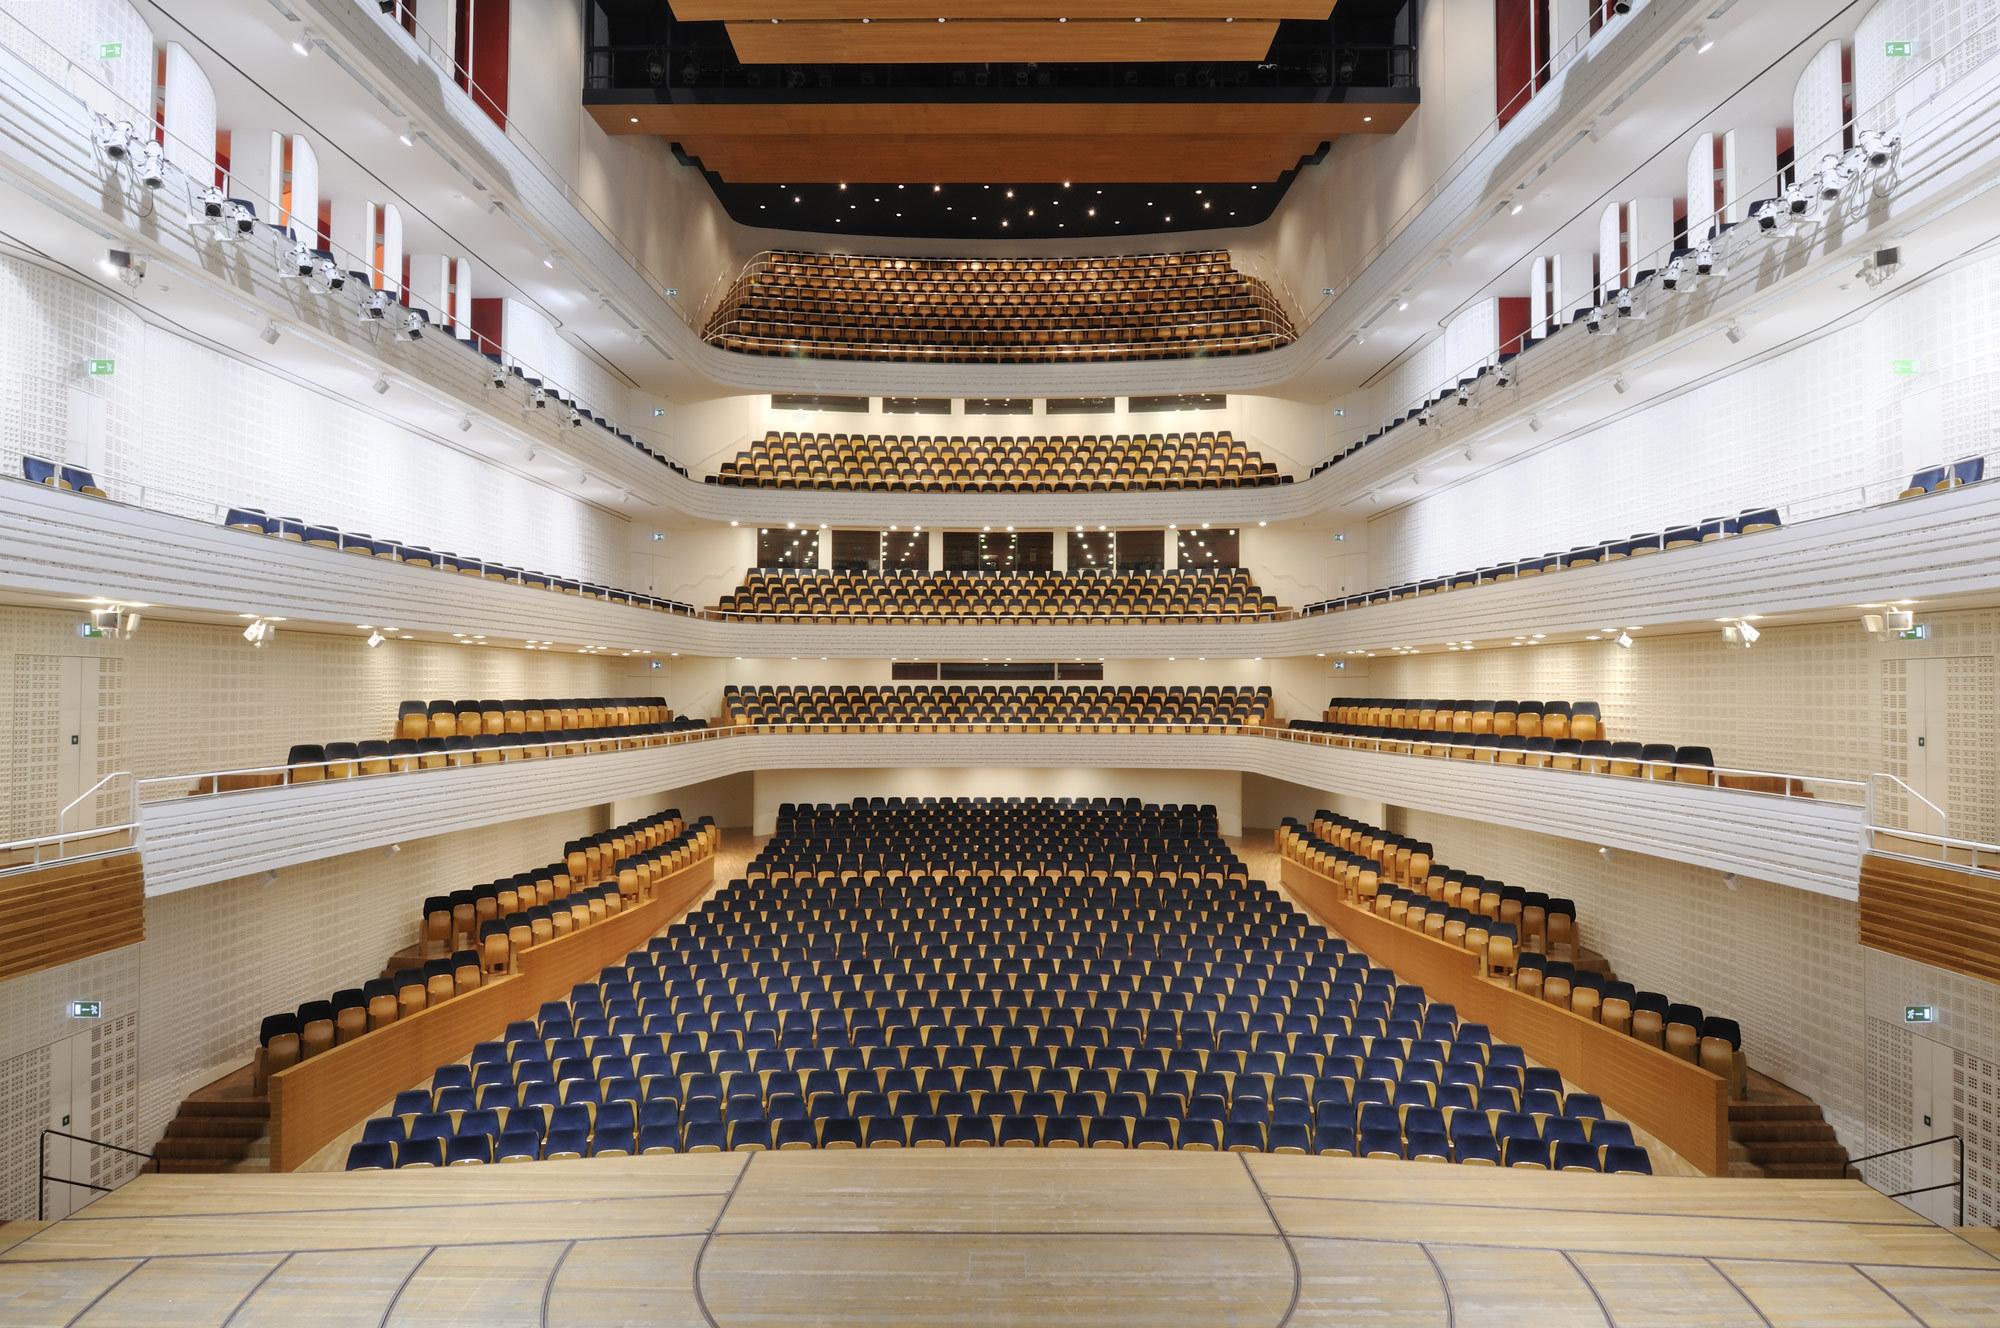 Kultur- und Kongresszentrum Luzern (KKL), Foto: Daniel Kuhn